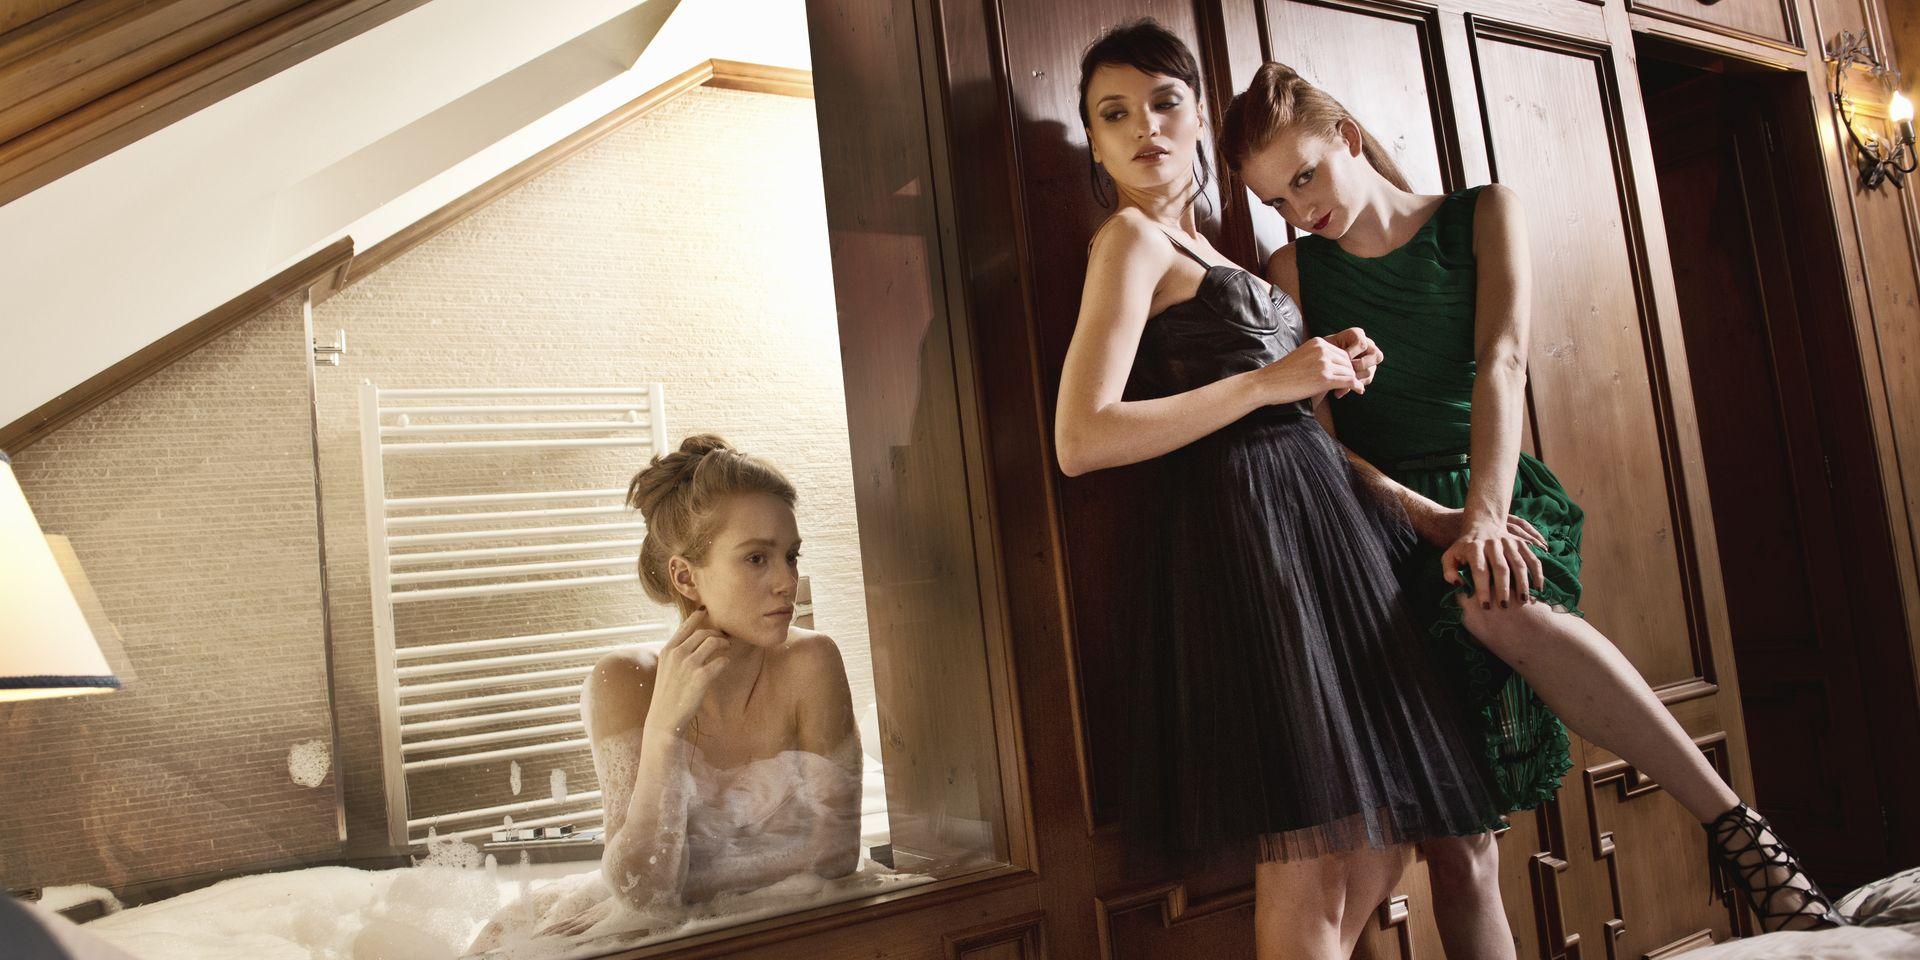 Afrodite Hotel Ambra Cortina 63025